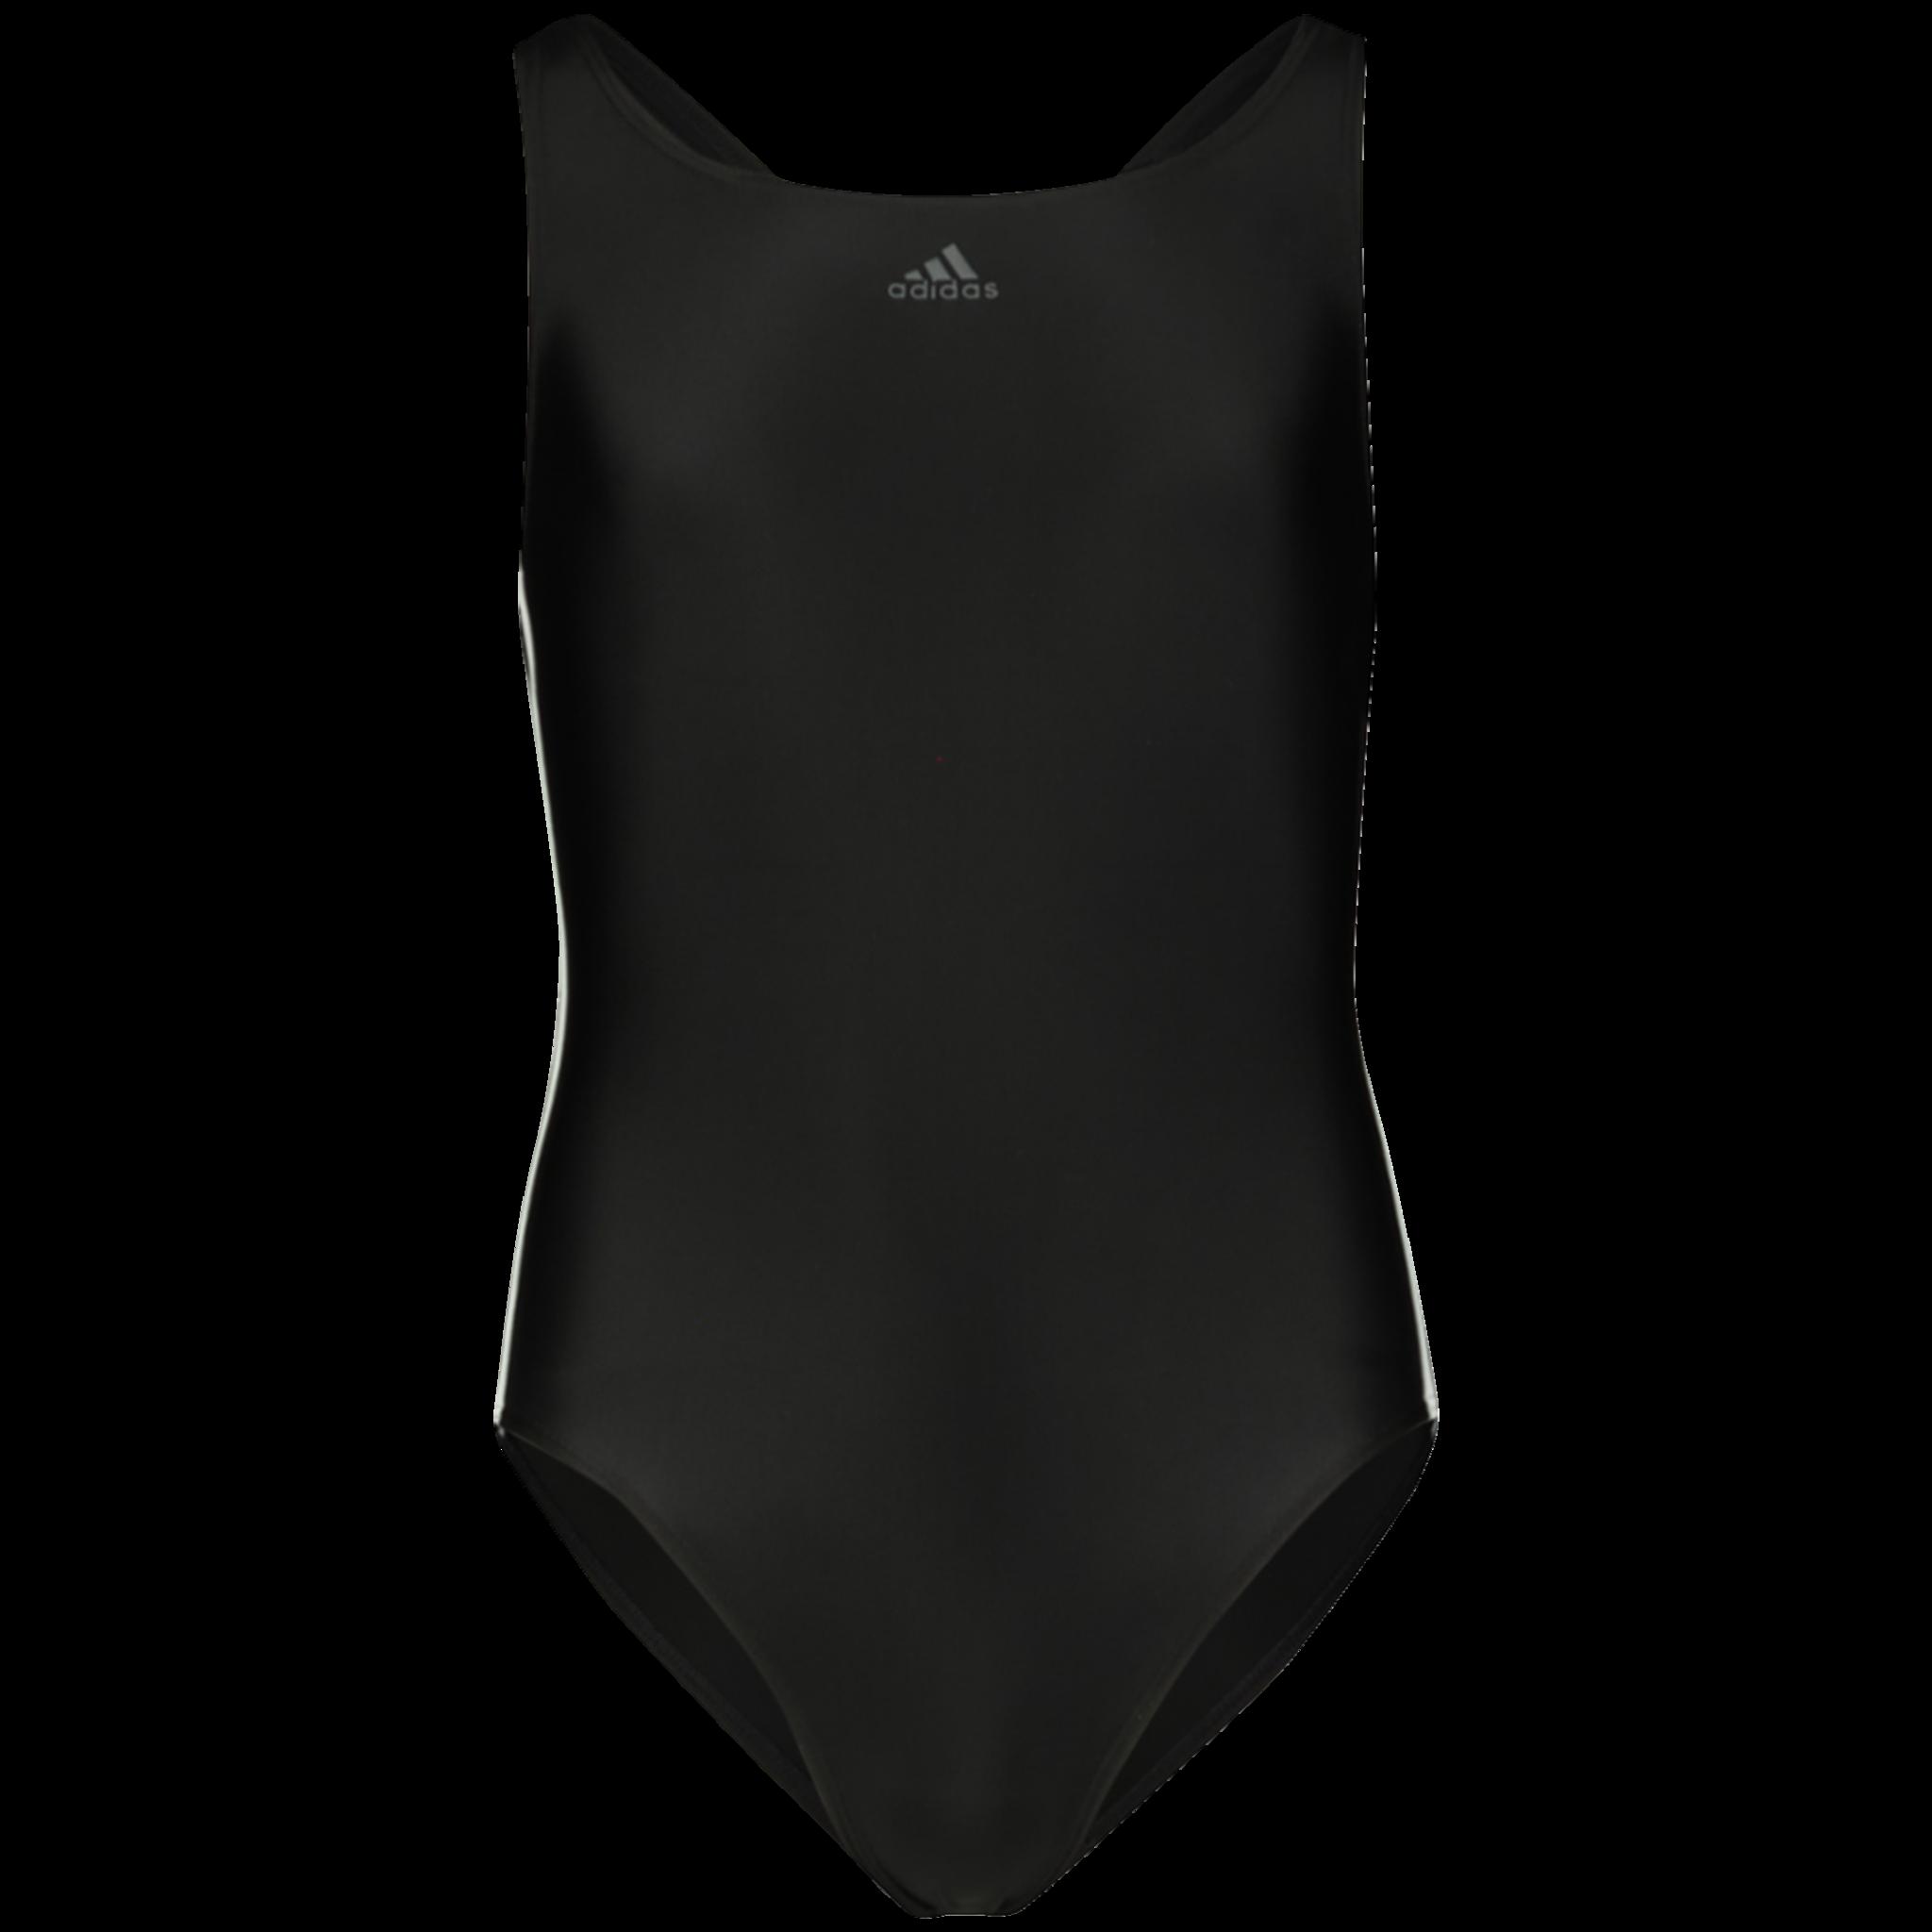 Athly V 3 Stripes Swimsuit, baddräkt junior